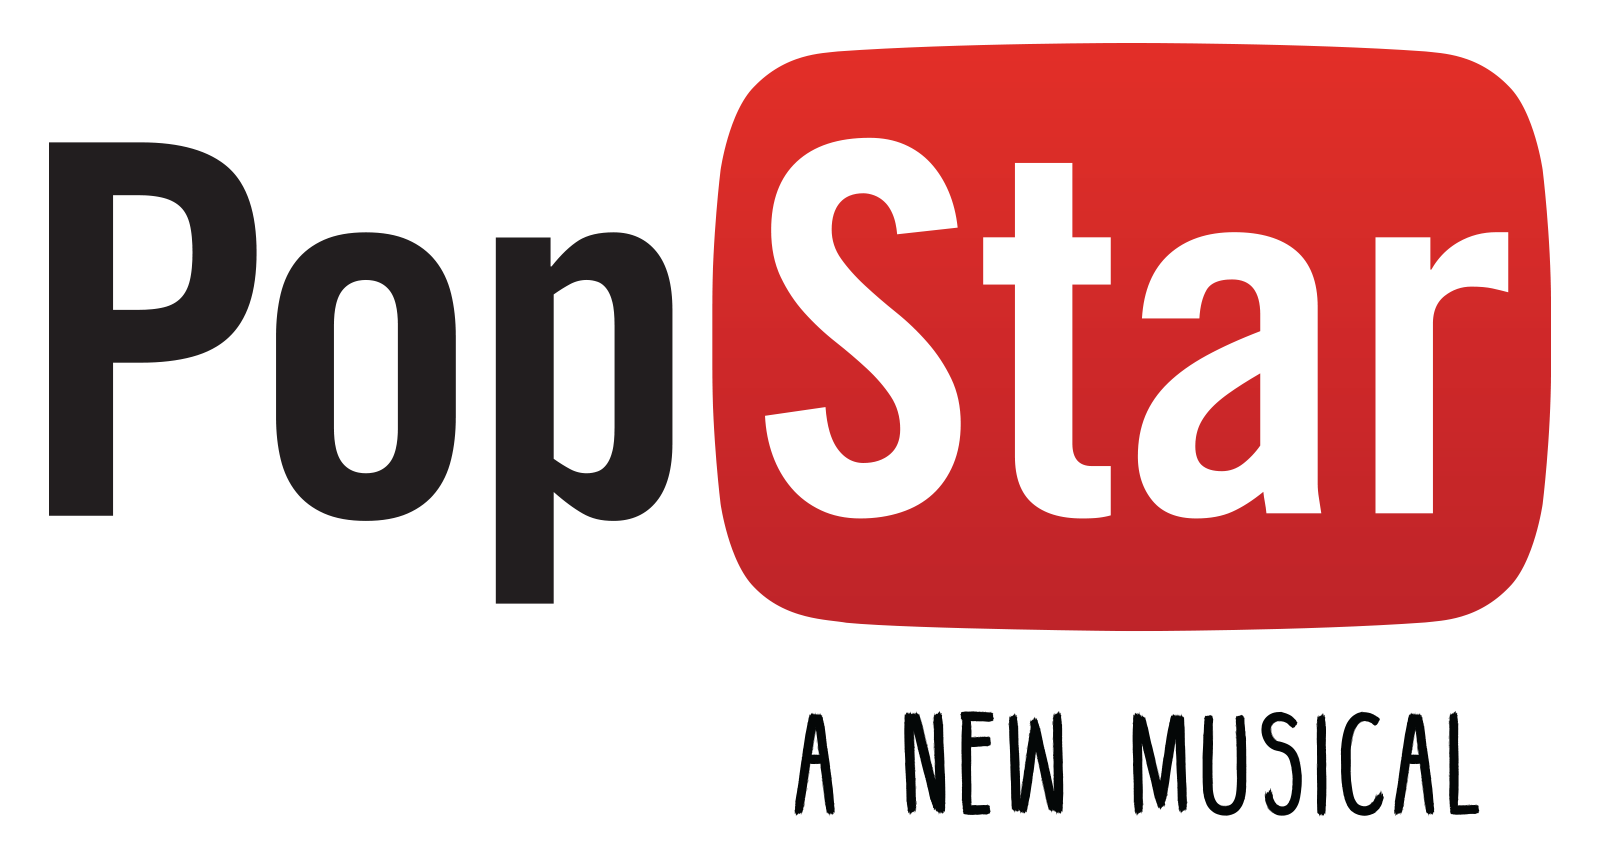 PopStar Musical